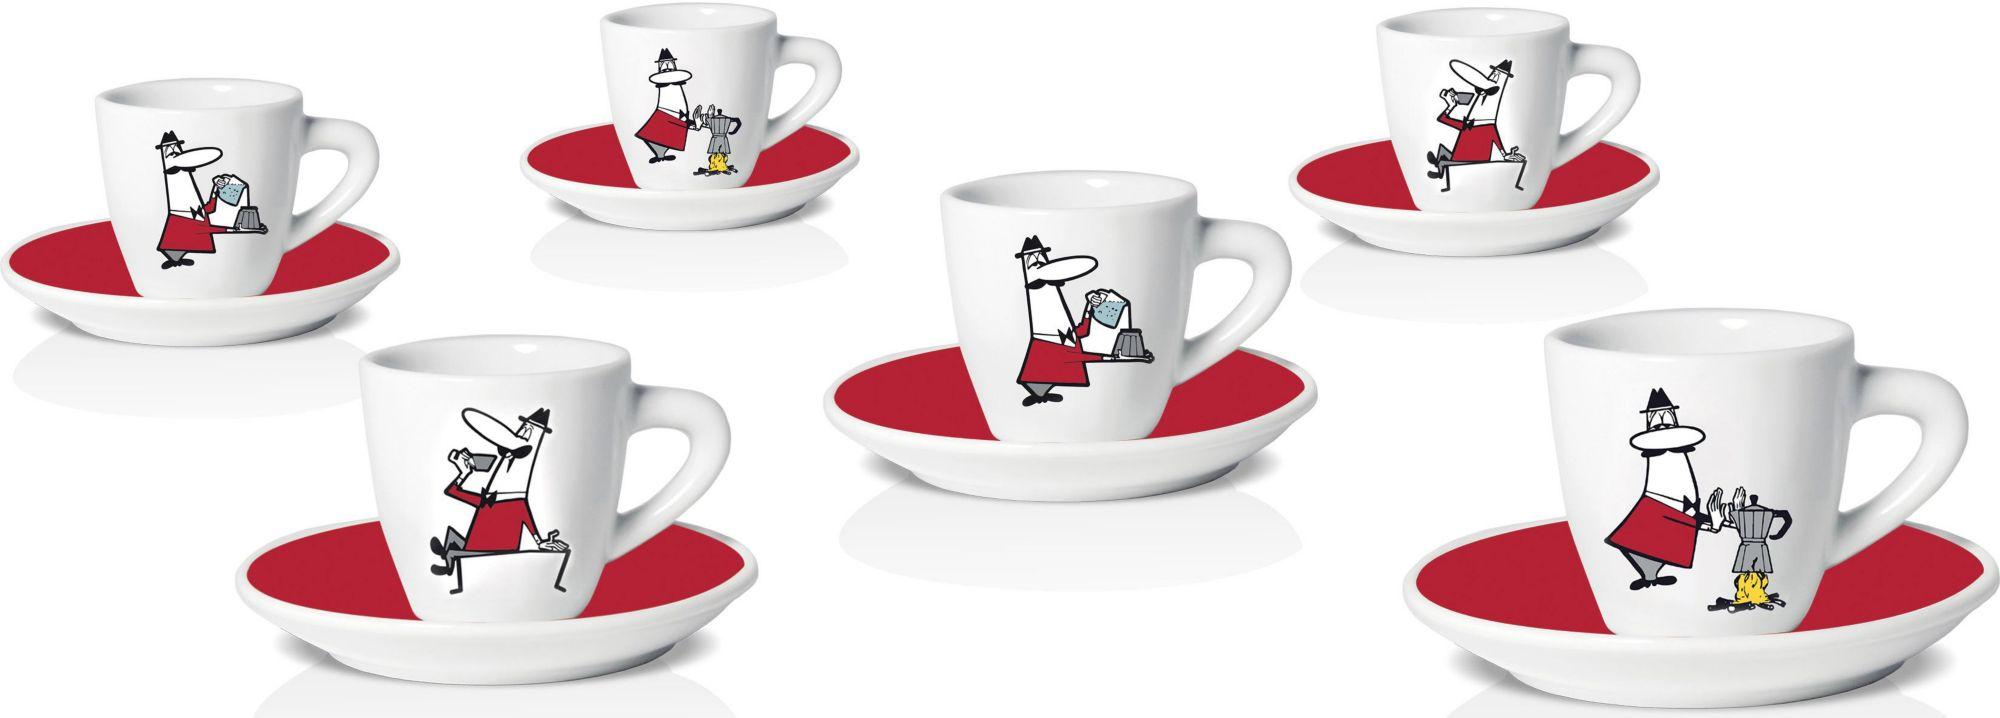 BIALETTI Espressotassen Set, Porzellan, 12 Teile, »OMINO«